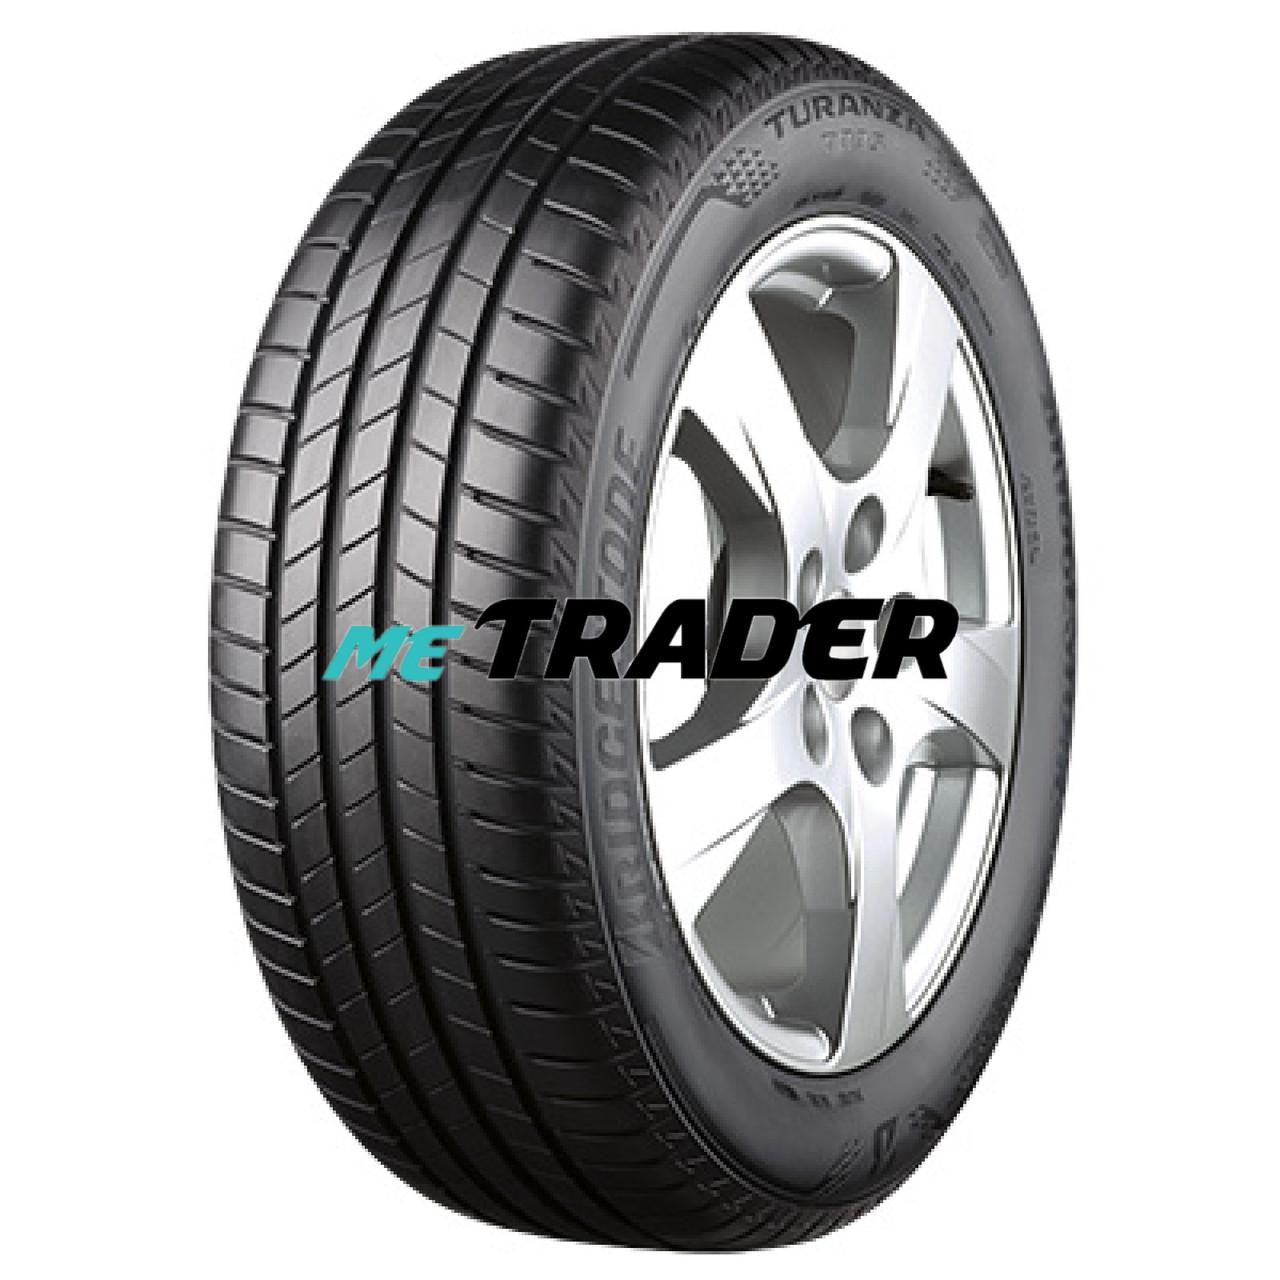 Bridgestone Turanza T005 235/50 R18 97V